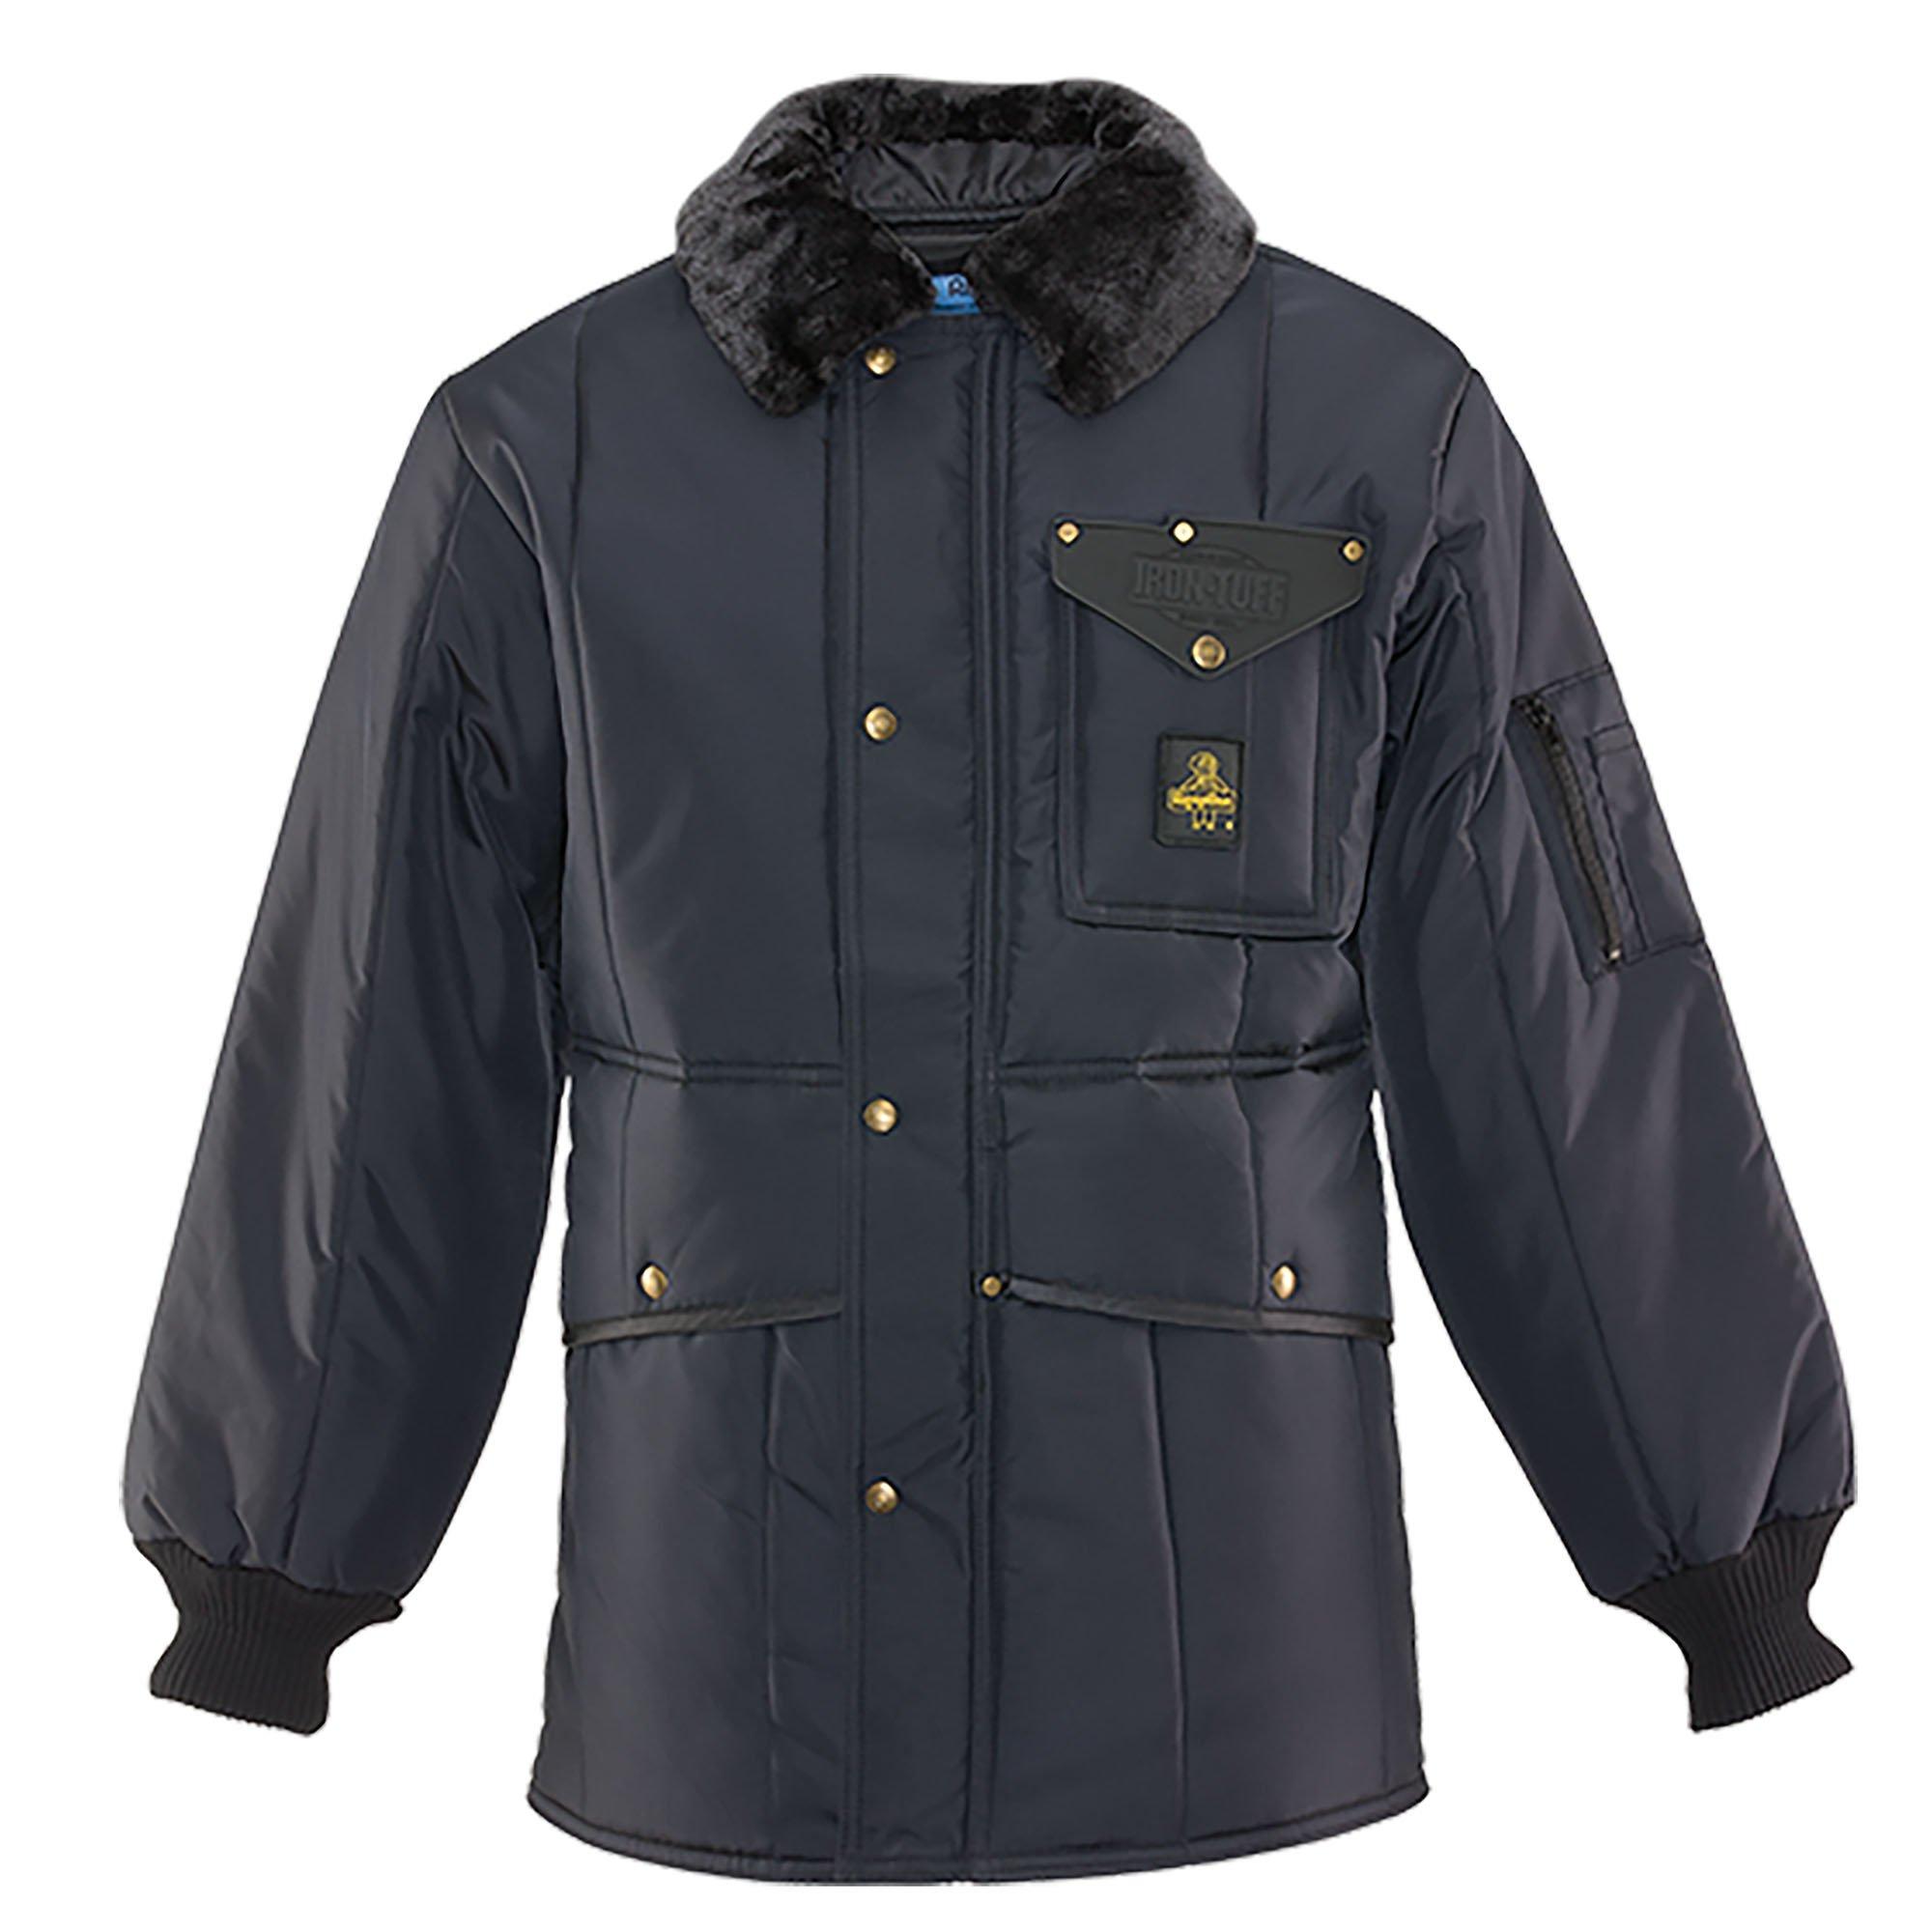 RefrigiWear Men's Iron-Tuff Jackoat Workwear Jacket, Navy 2XL Tall